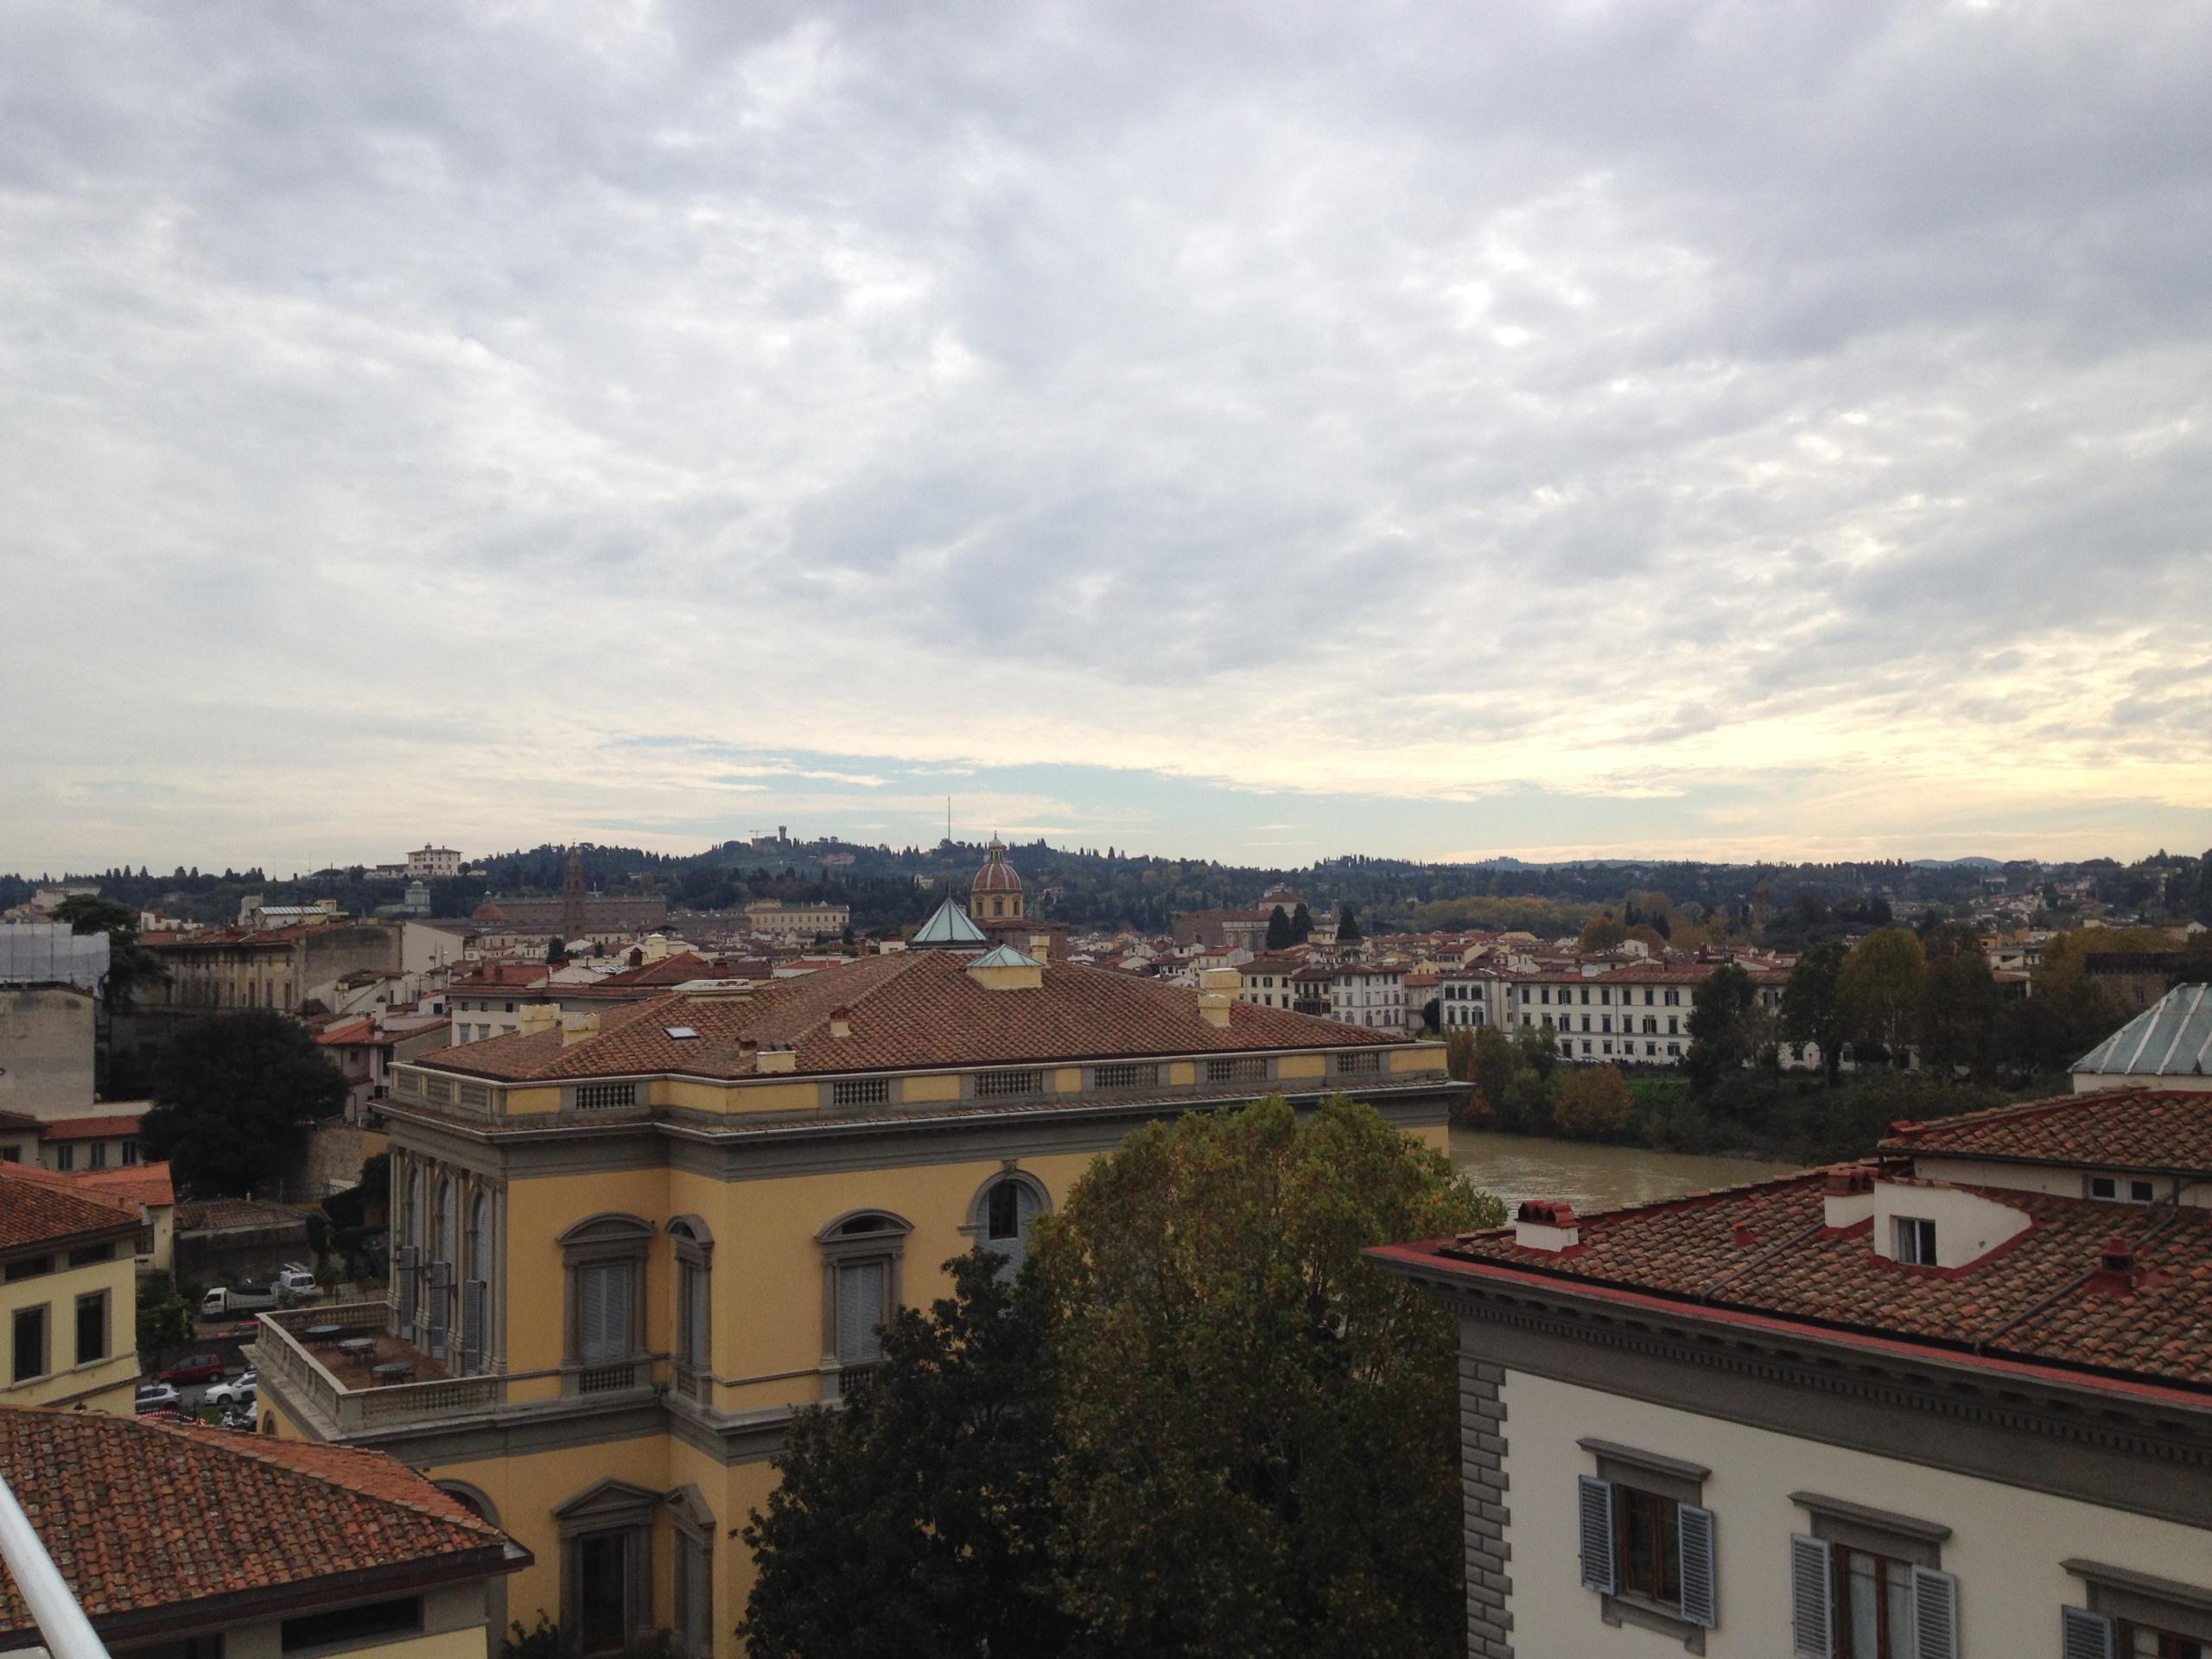 Firenze, Tuscany